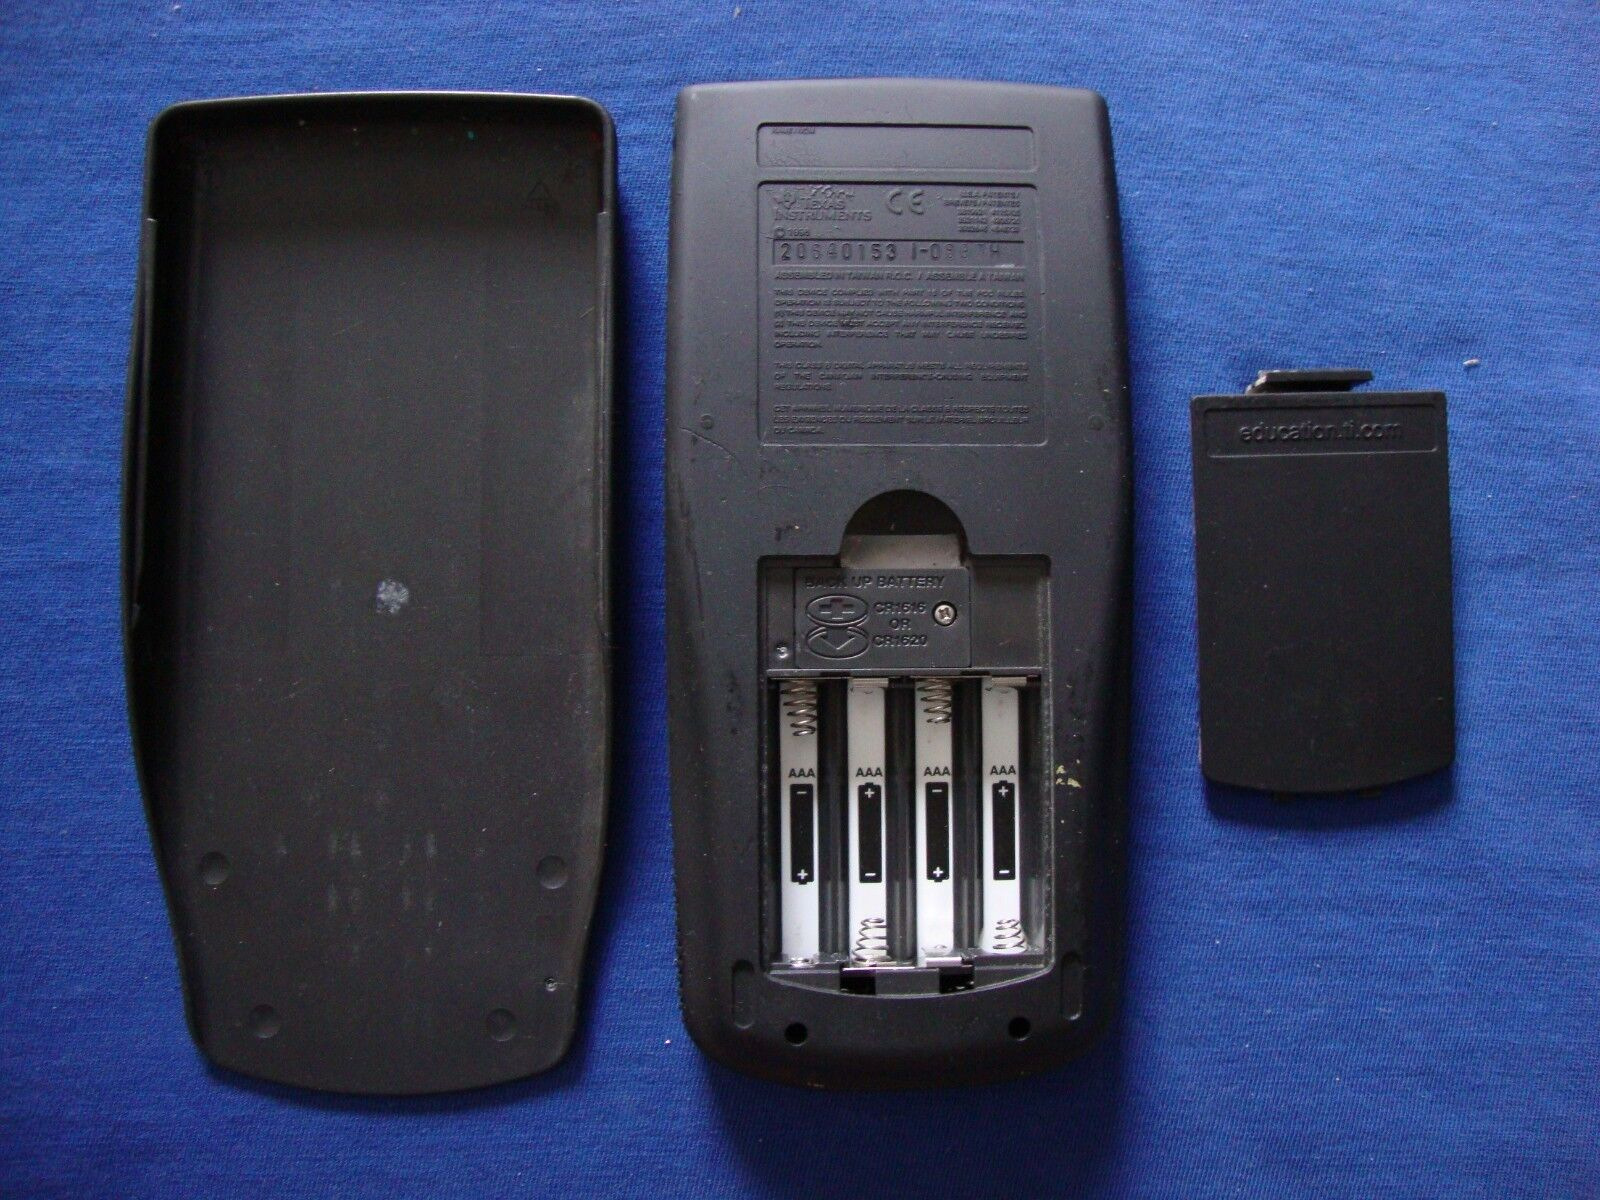 ti-83 graphic calculator plus ... Image 2